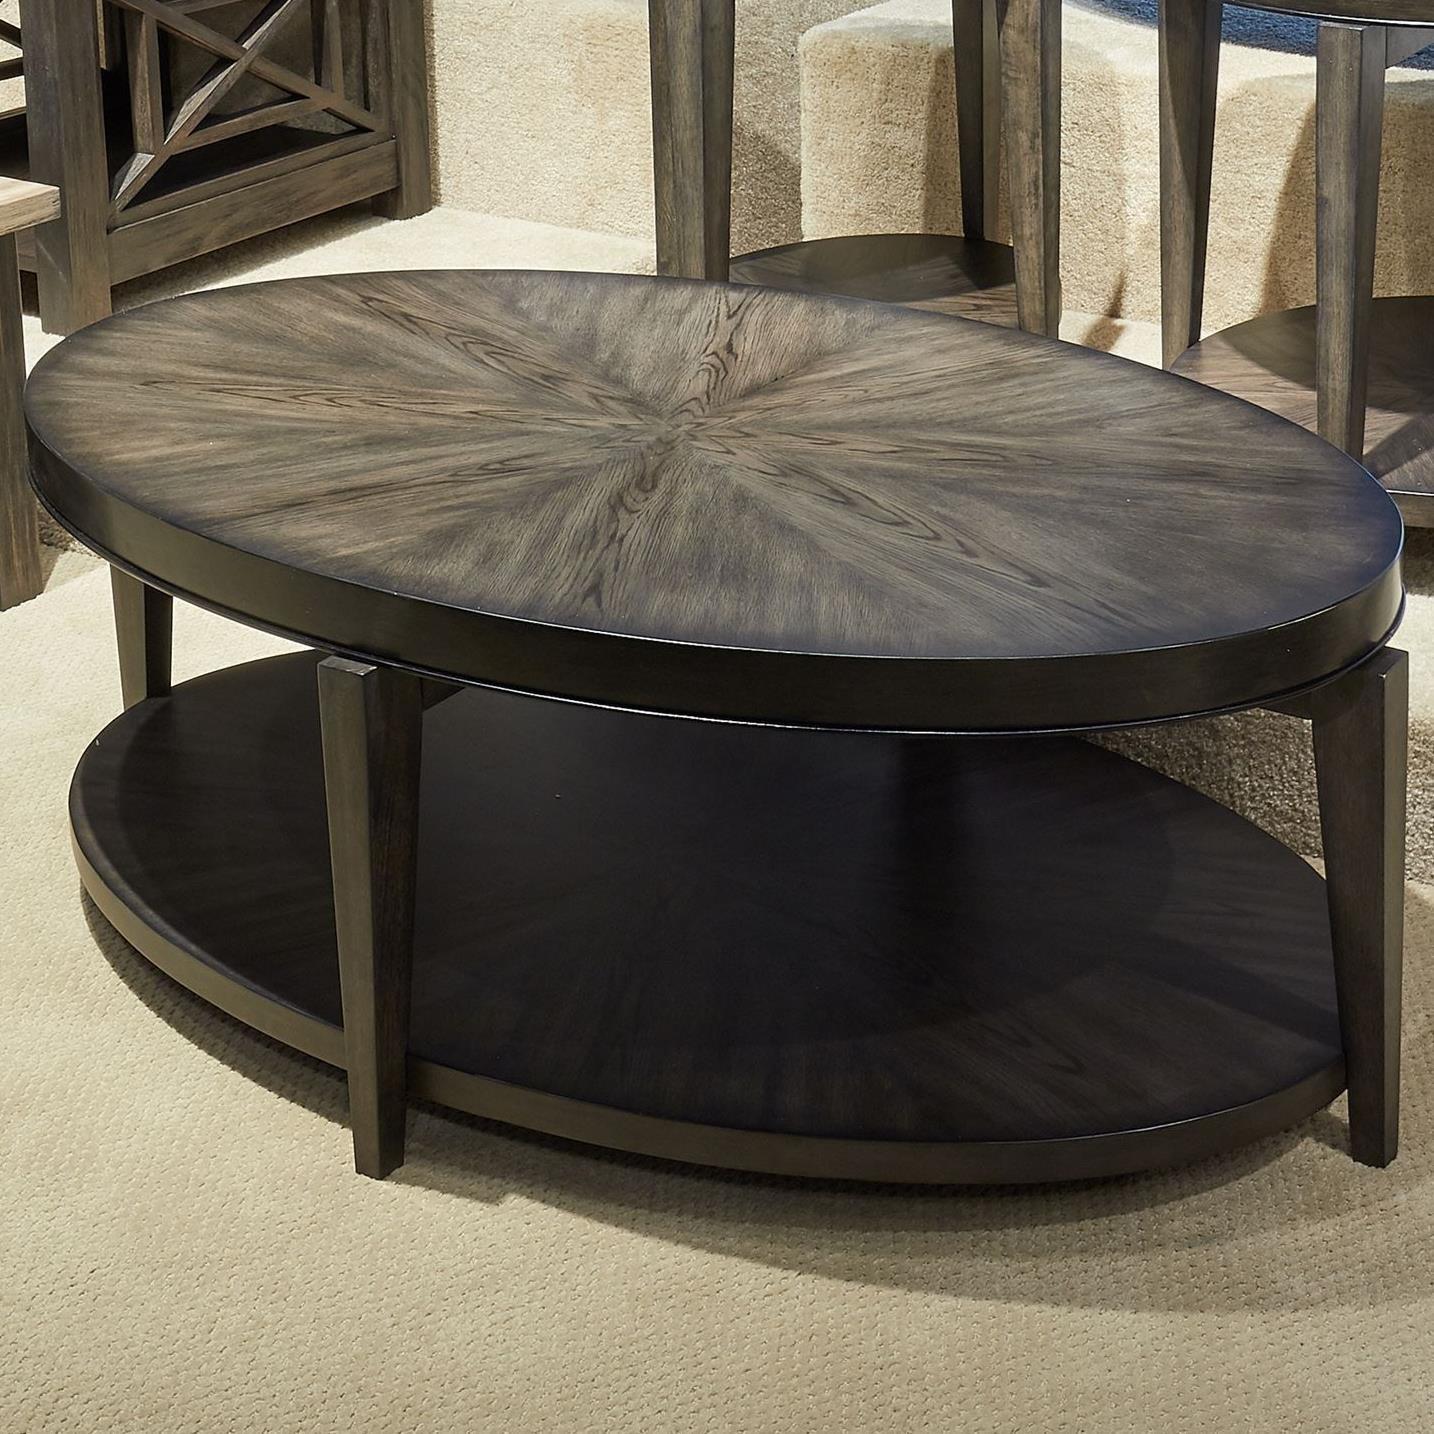 Beau Royal Furniture